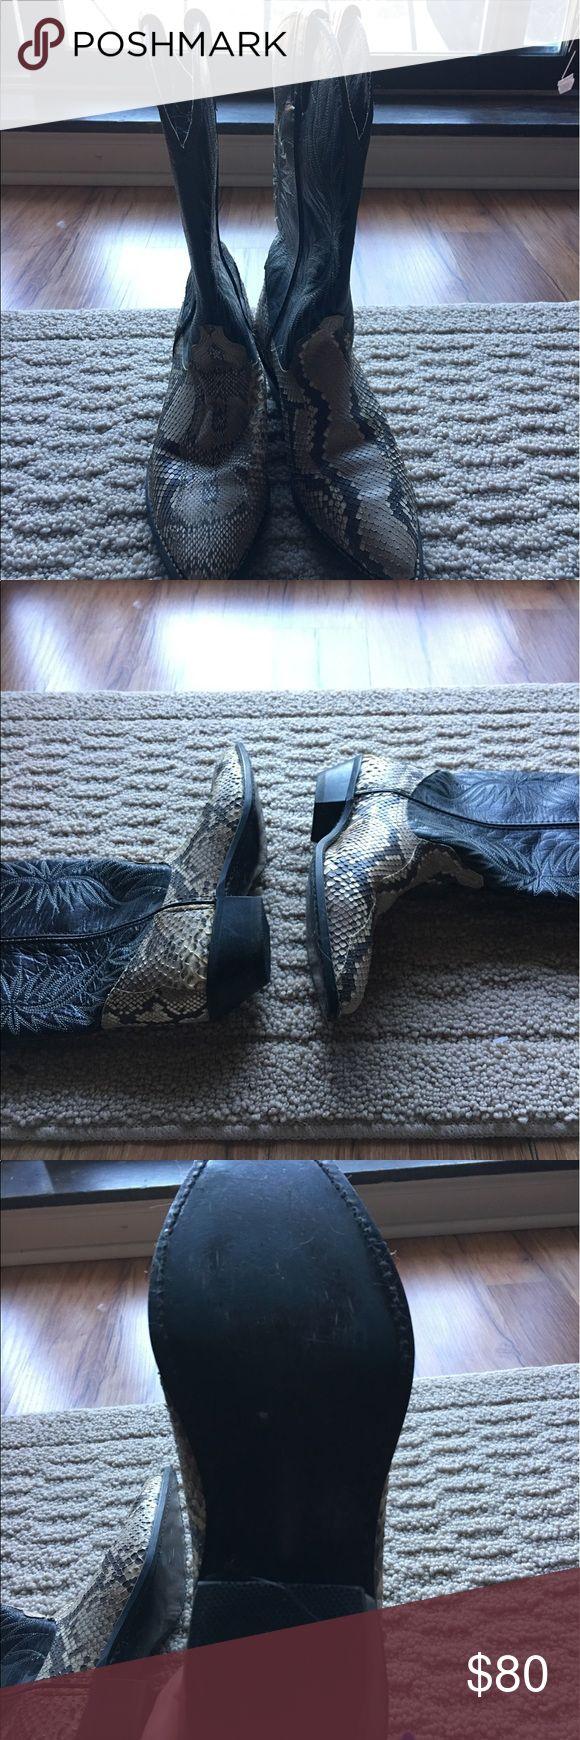 Handmade Snakeskin Cowboy Boots Size 8 Handmade Black,Brown and Beige Snakeskin Cowboy Boots. 8 Medium Worn Once custom Handmade  Shoes Heeled Boots